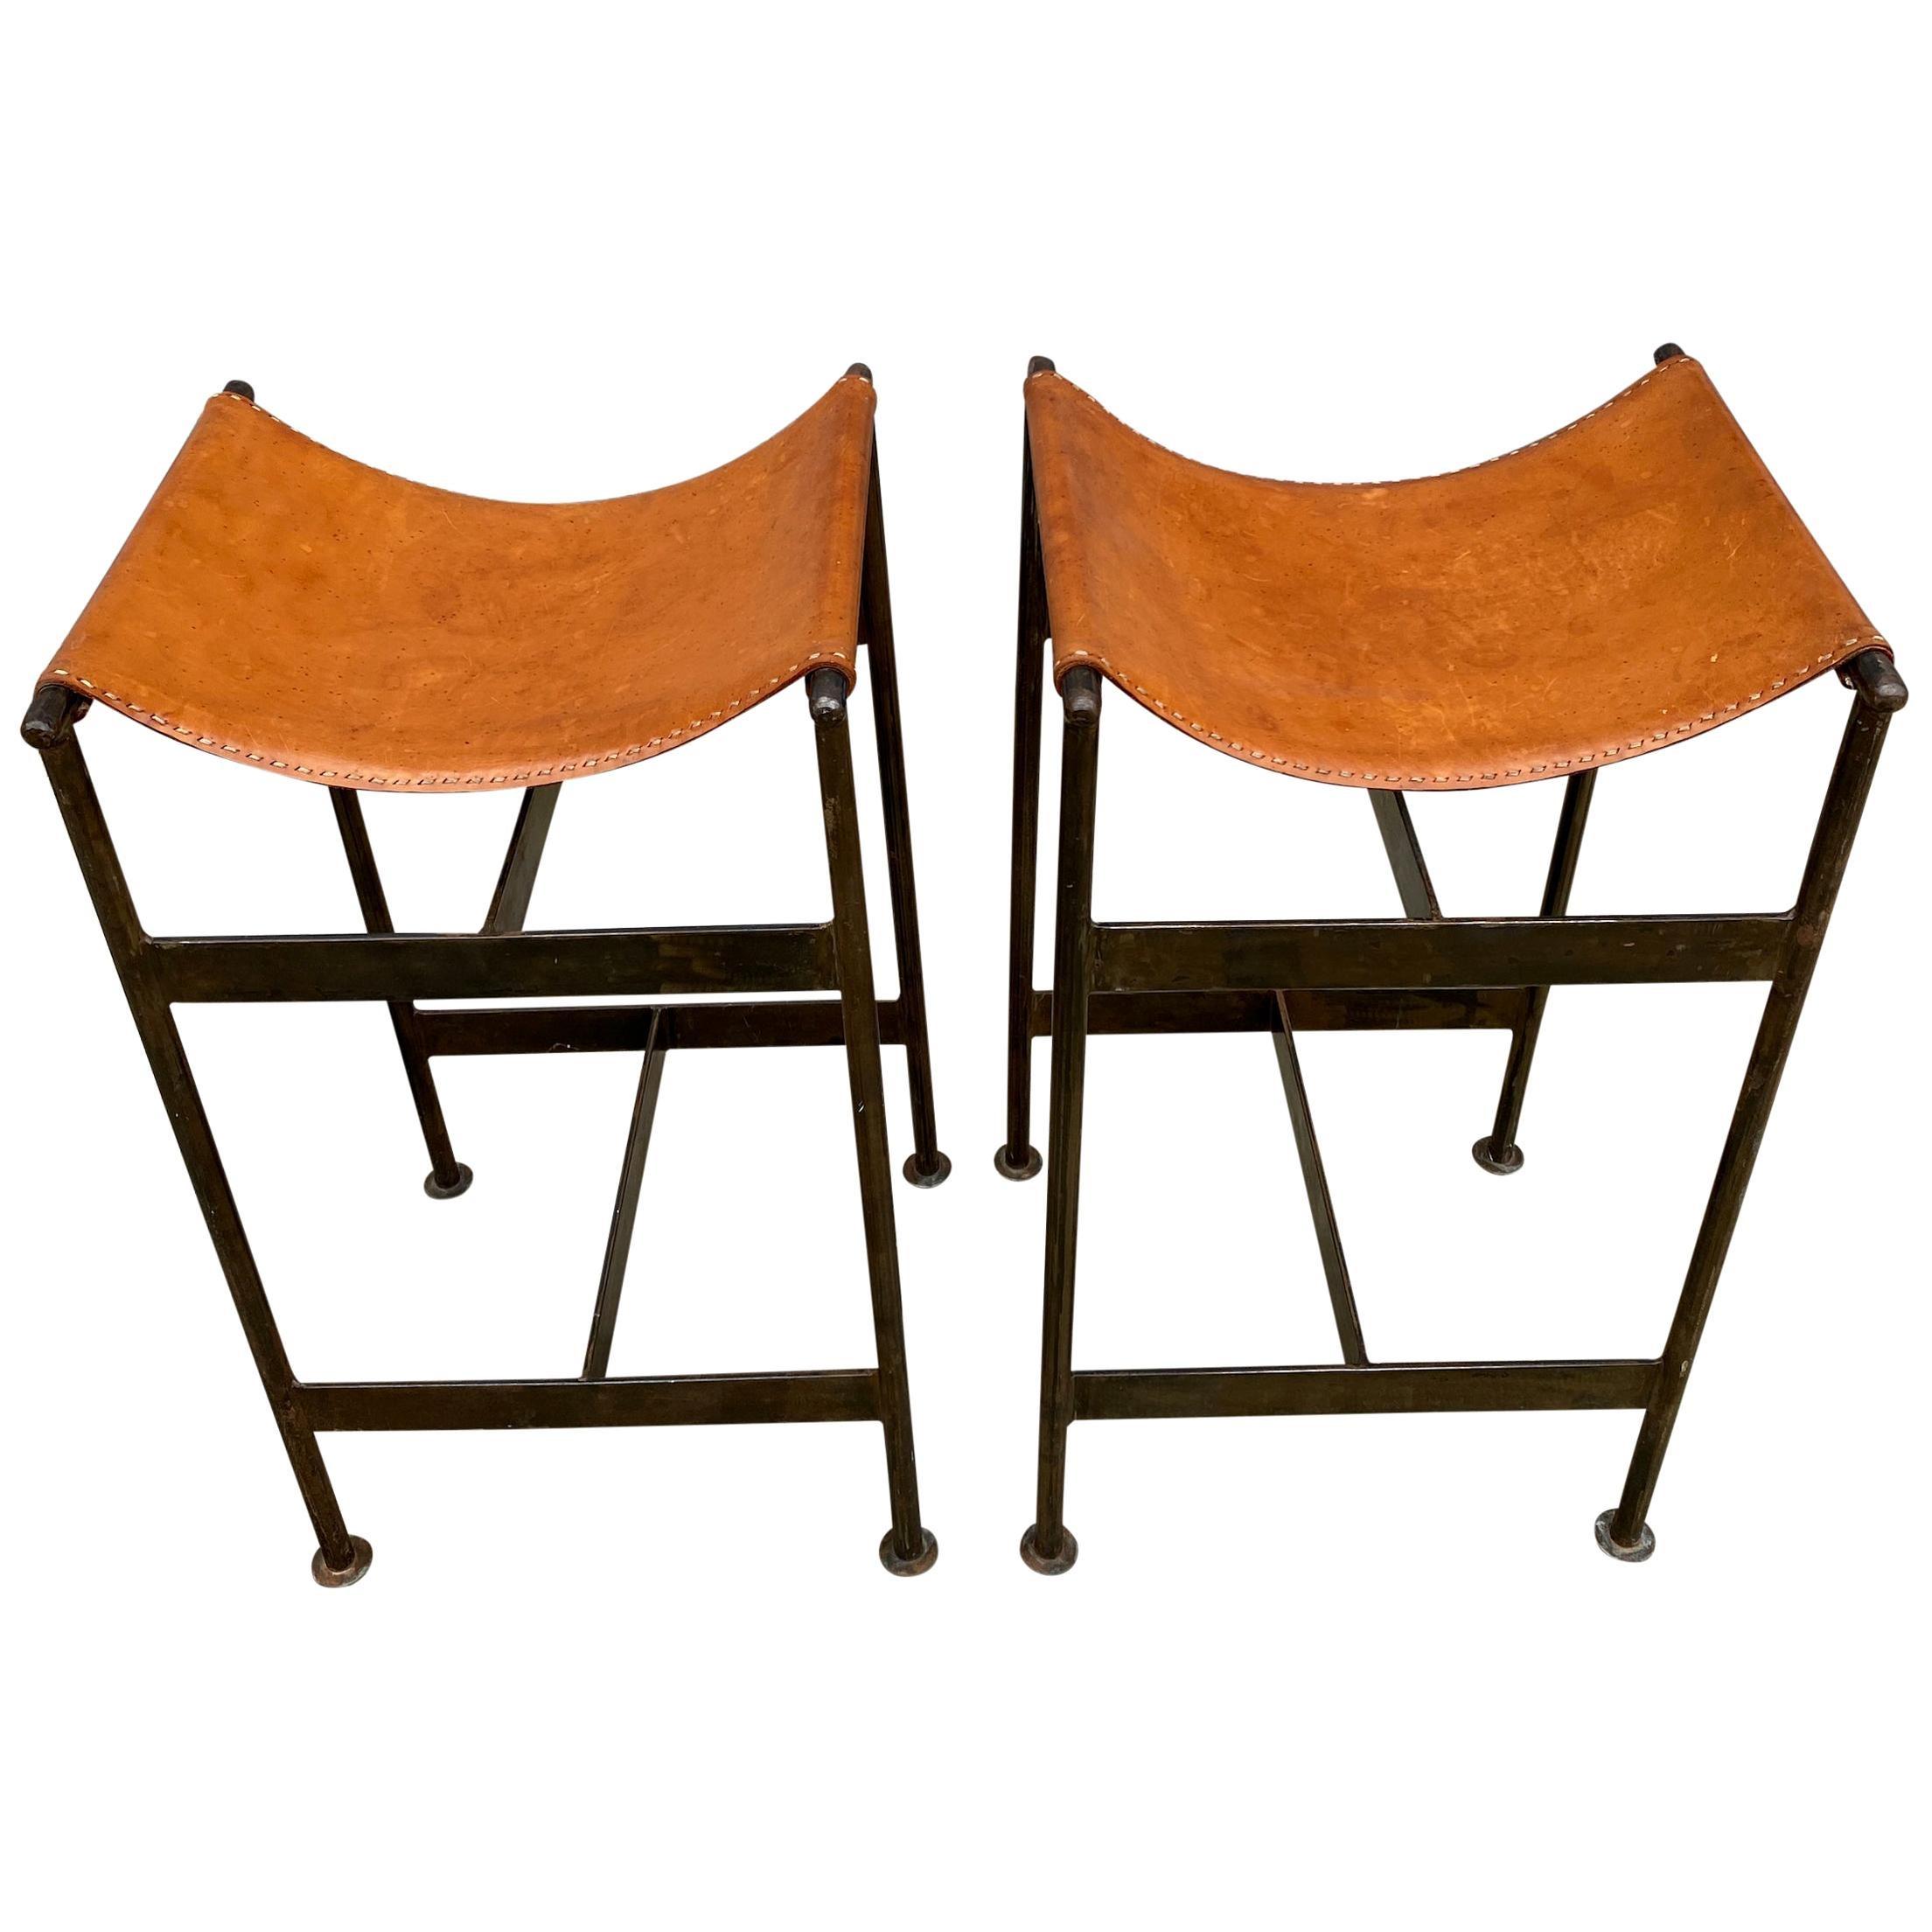 Midcentury Pair of Steel and Leather Sling Stools Style of William Katavolos